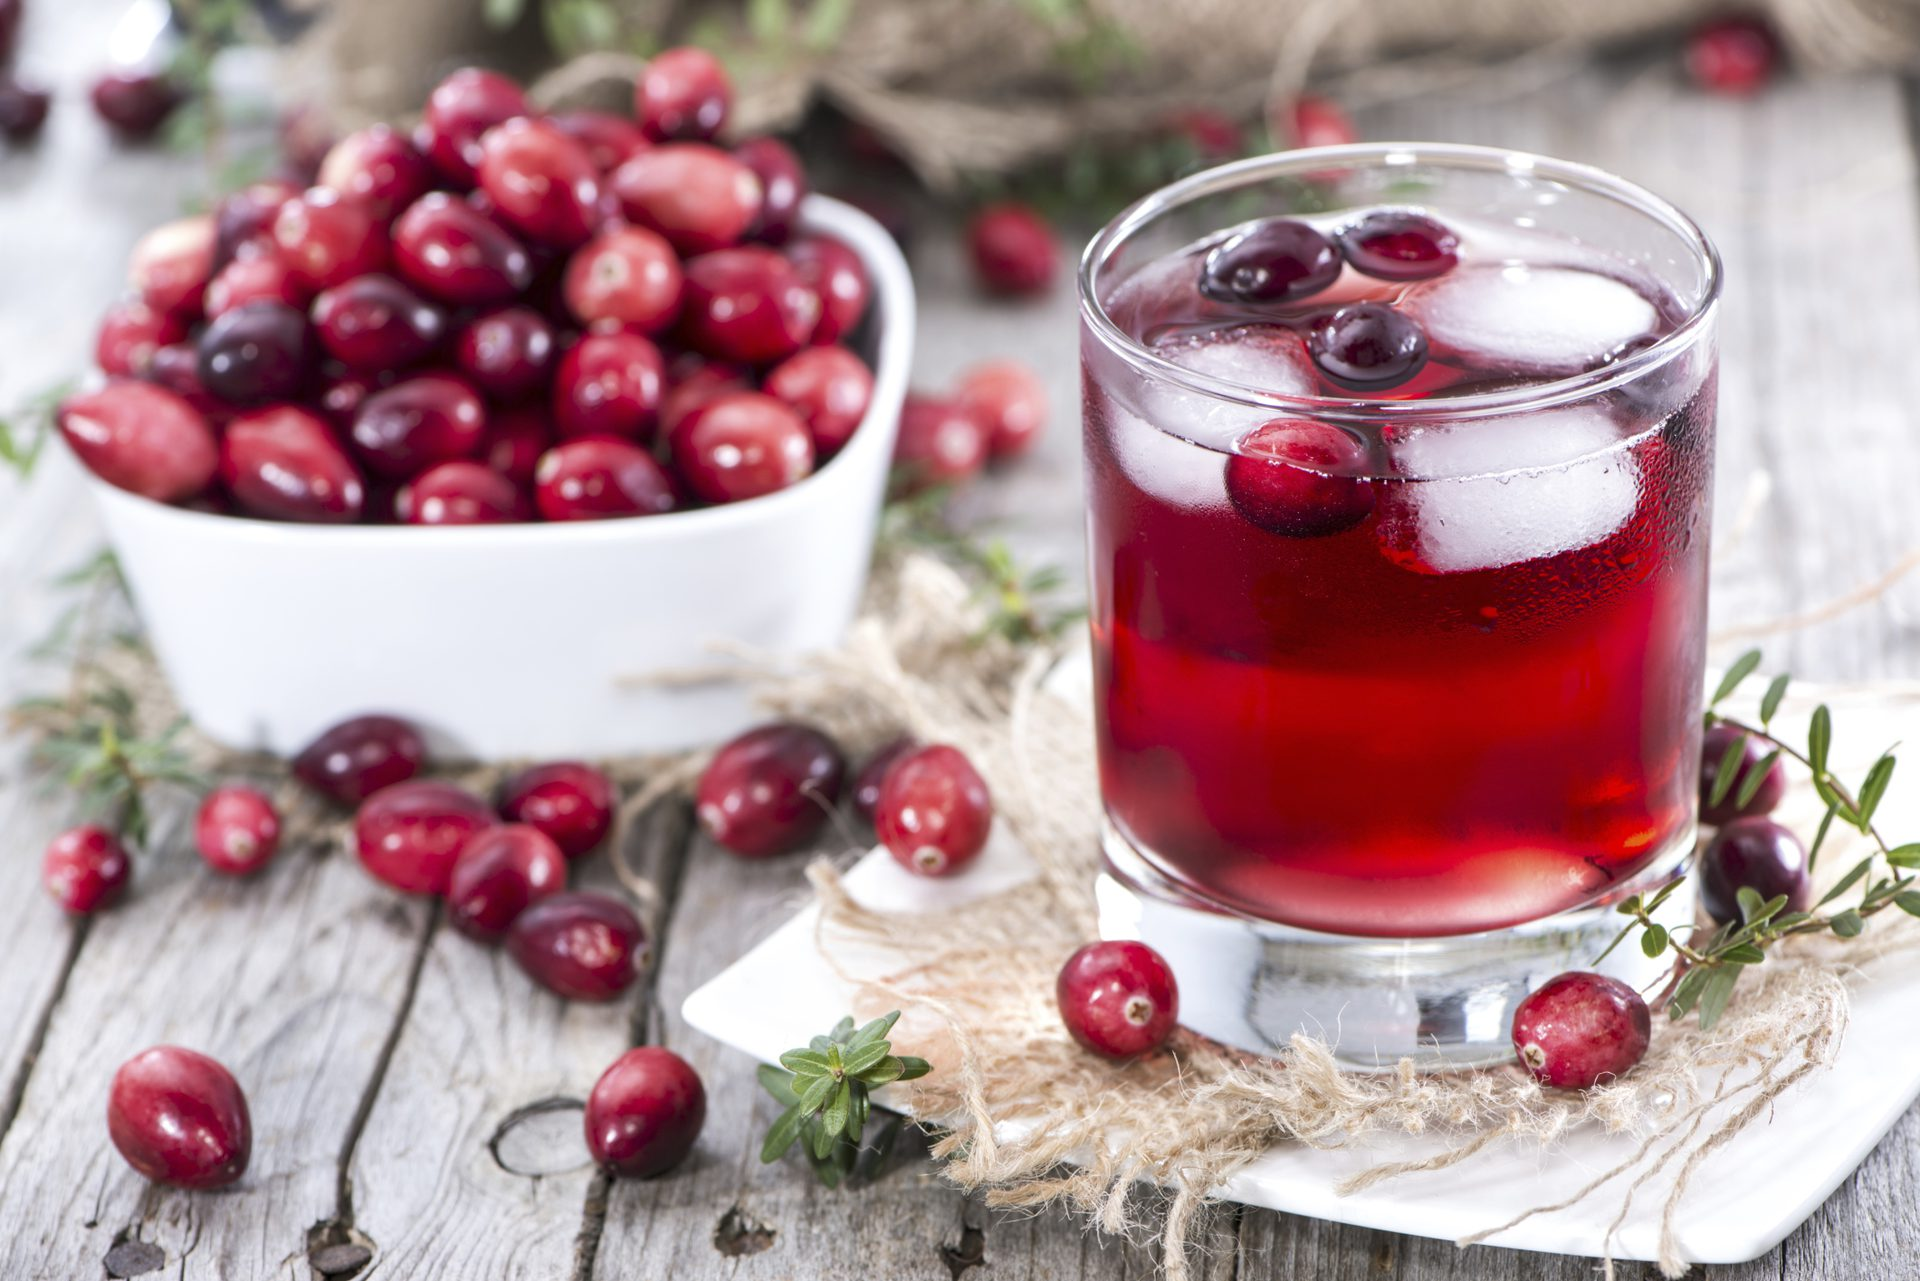 Cranberry juice cystitis treatment